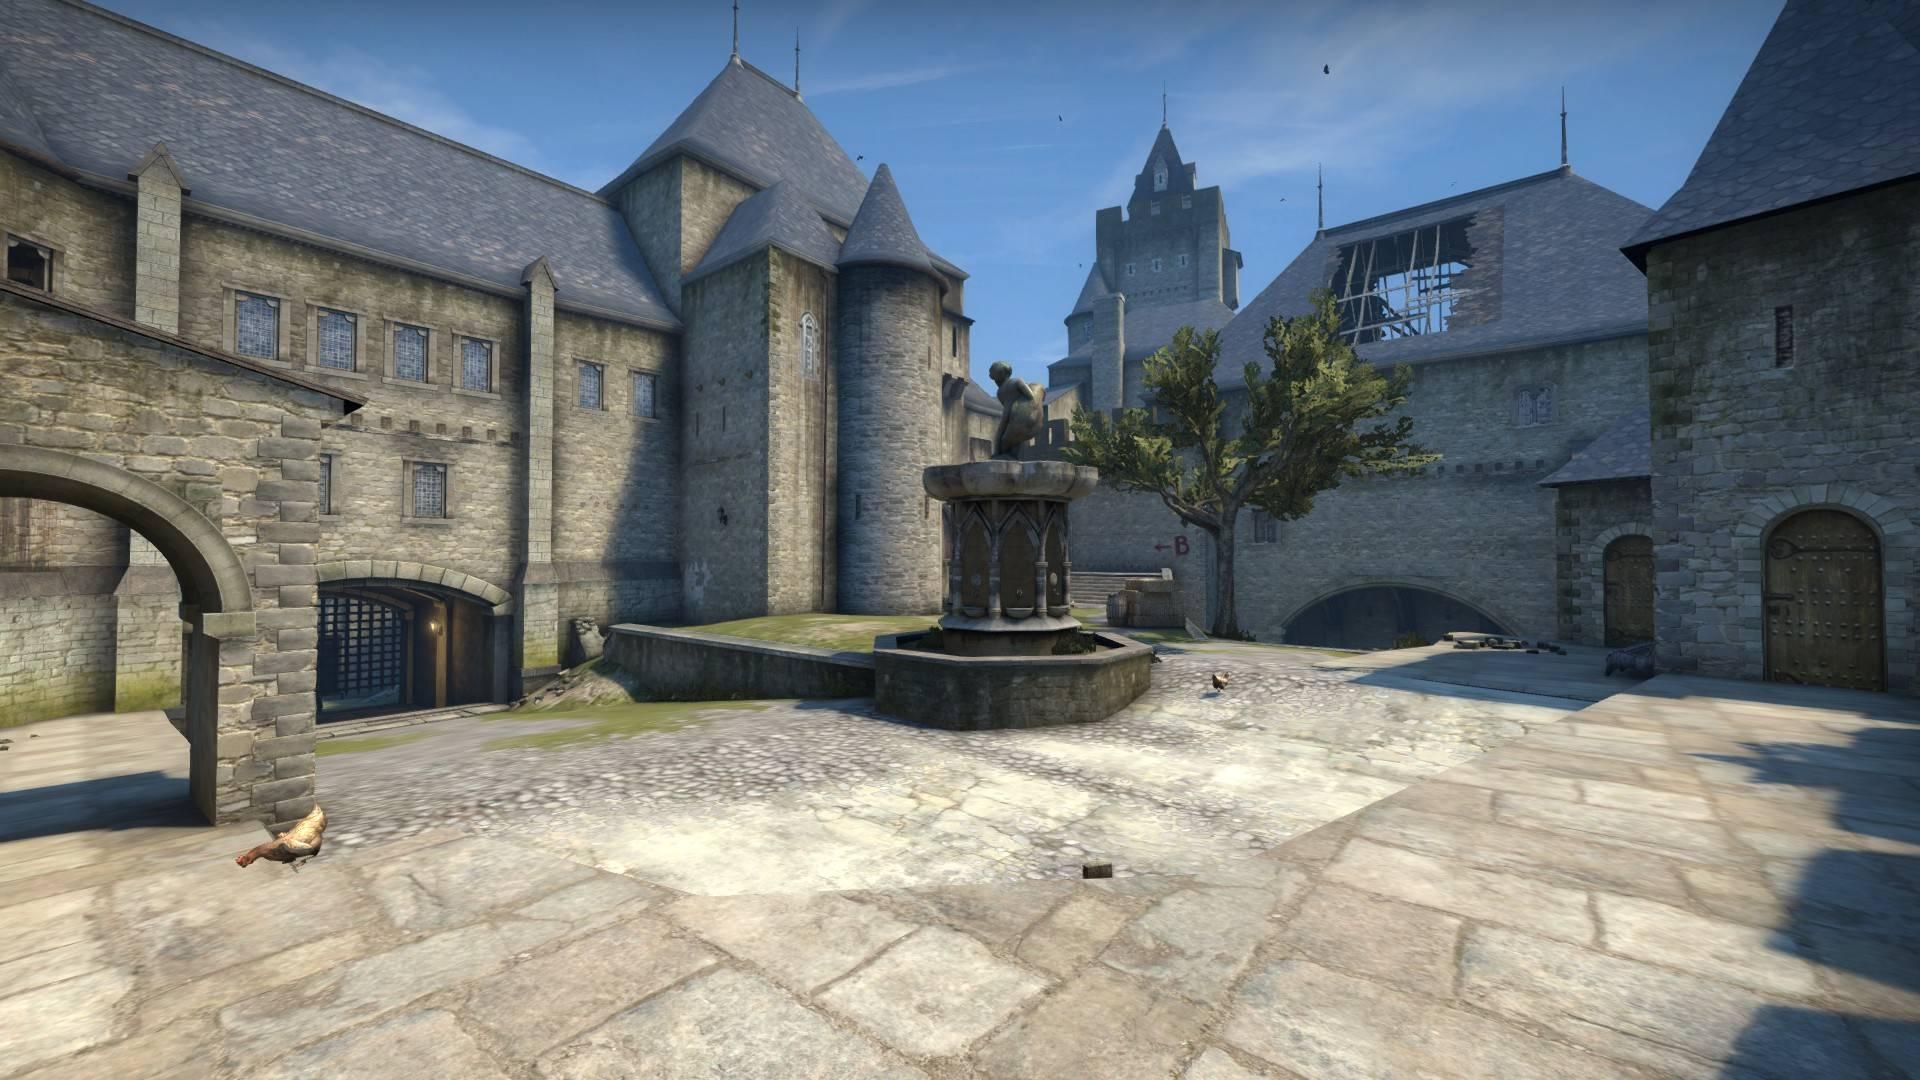 de_cobblestone courtyard